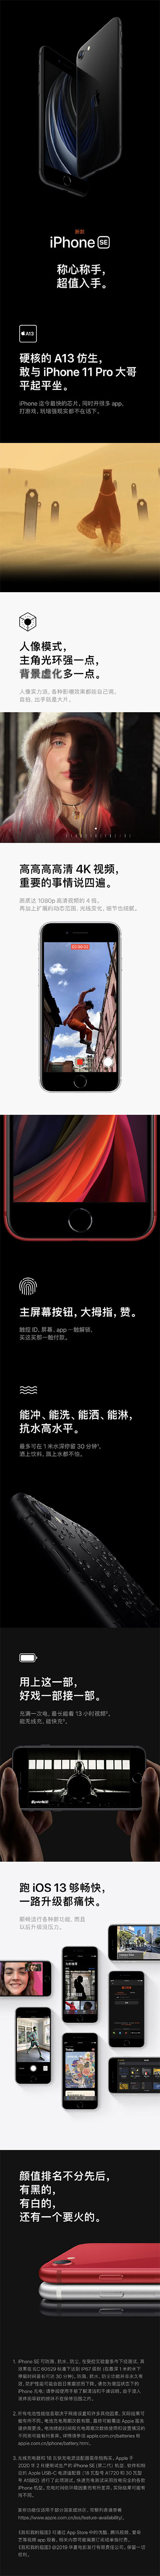 iPhone SE 2020来了,你想知道的都在这!